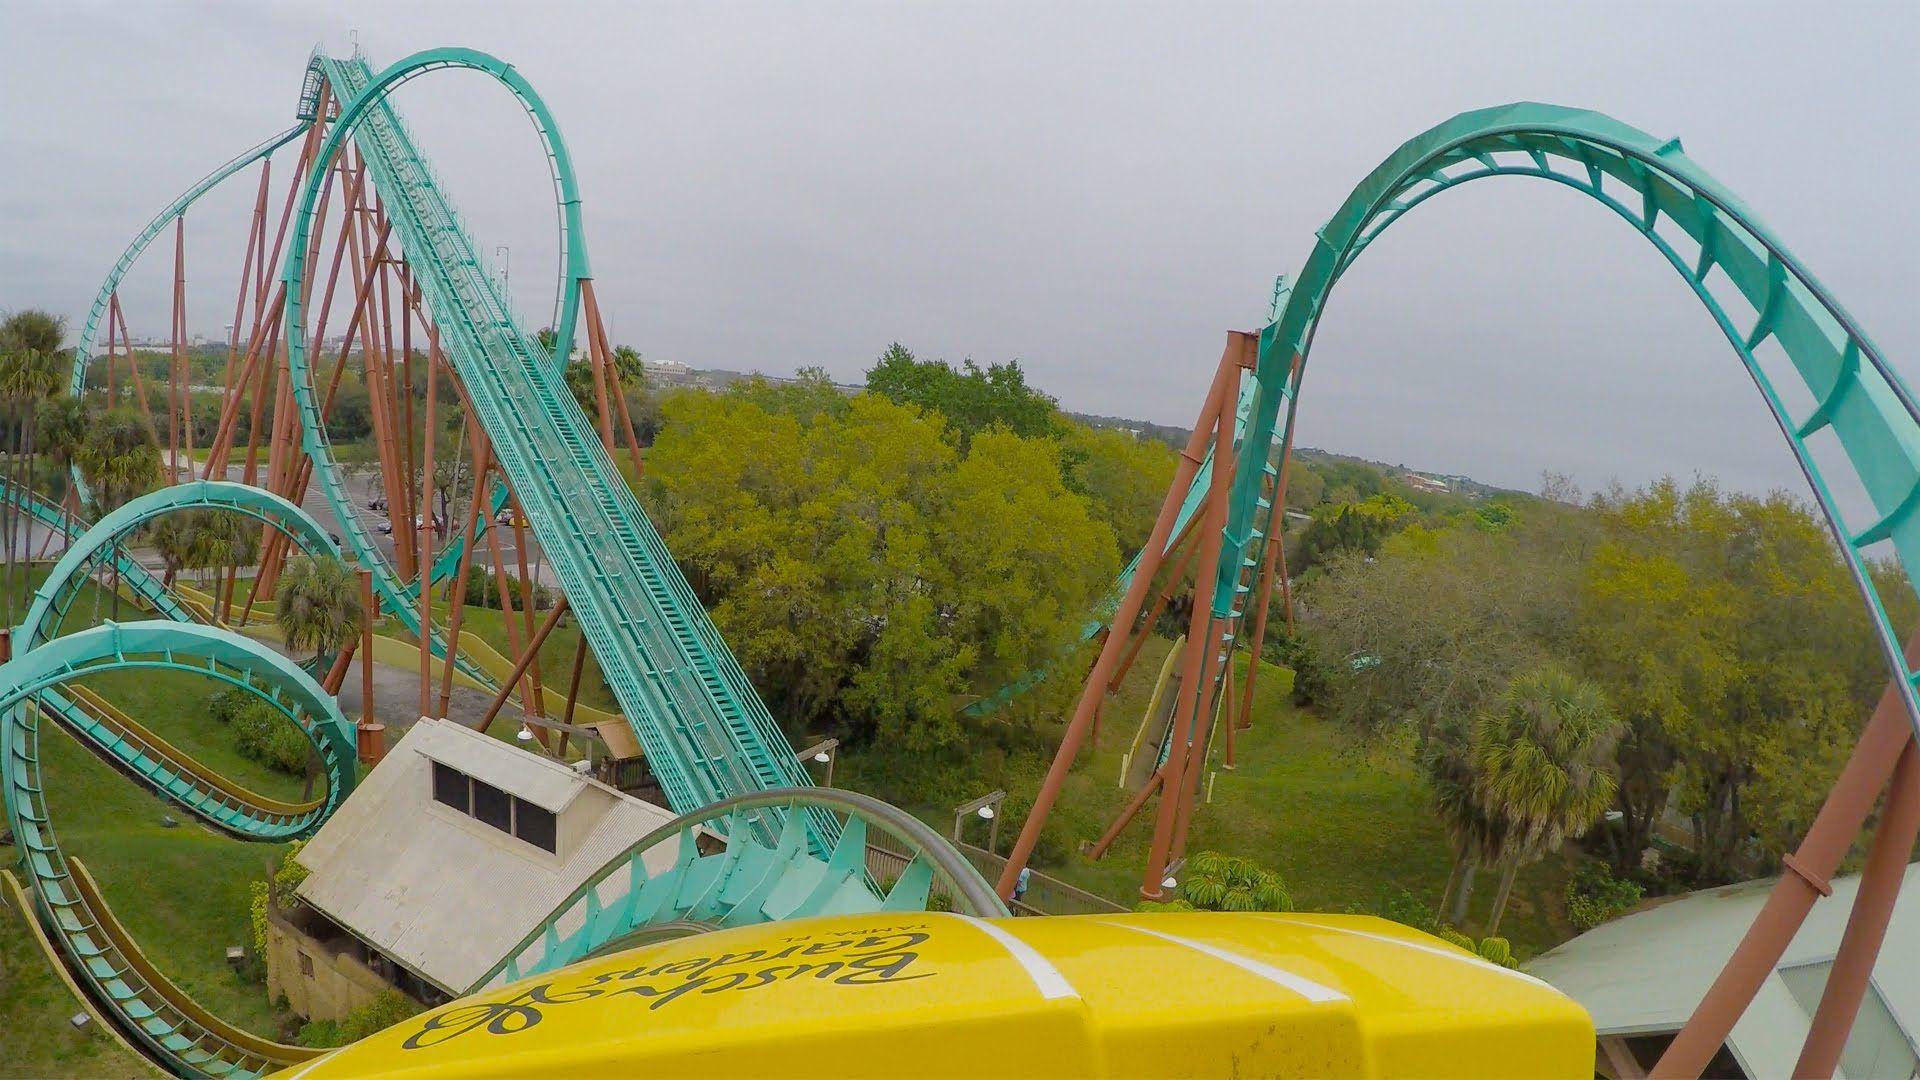 c7064ade38b3a976ce2ec11b31d71feb - Videos Of Rides At Busch Gardens